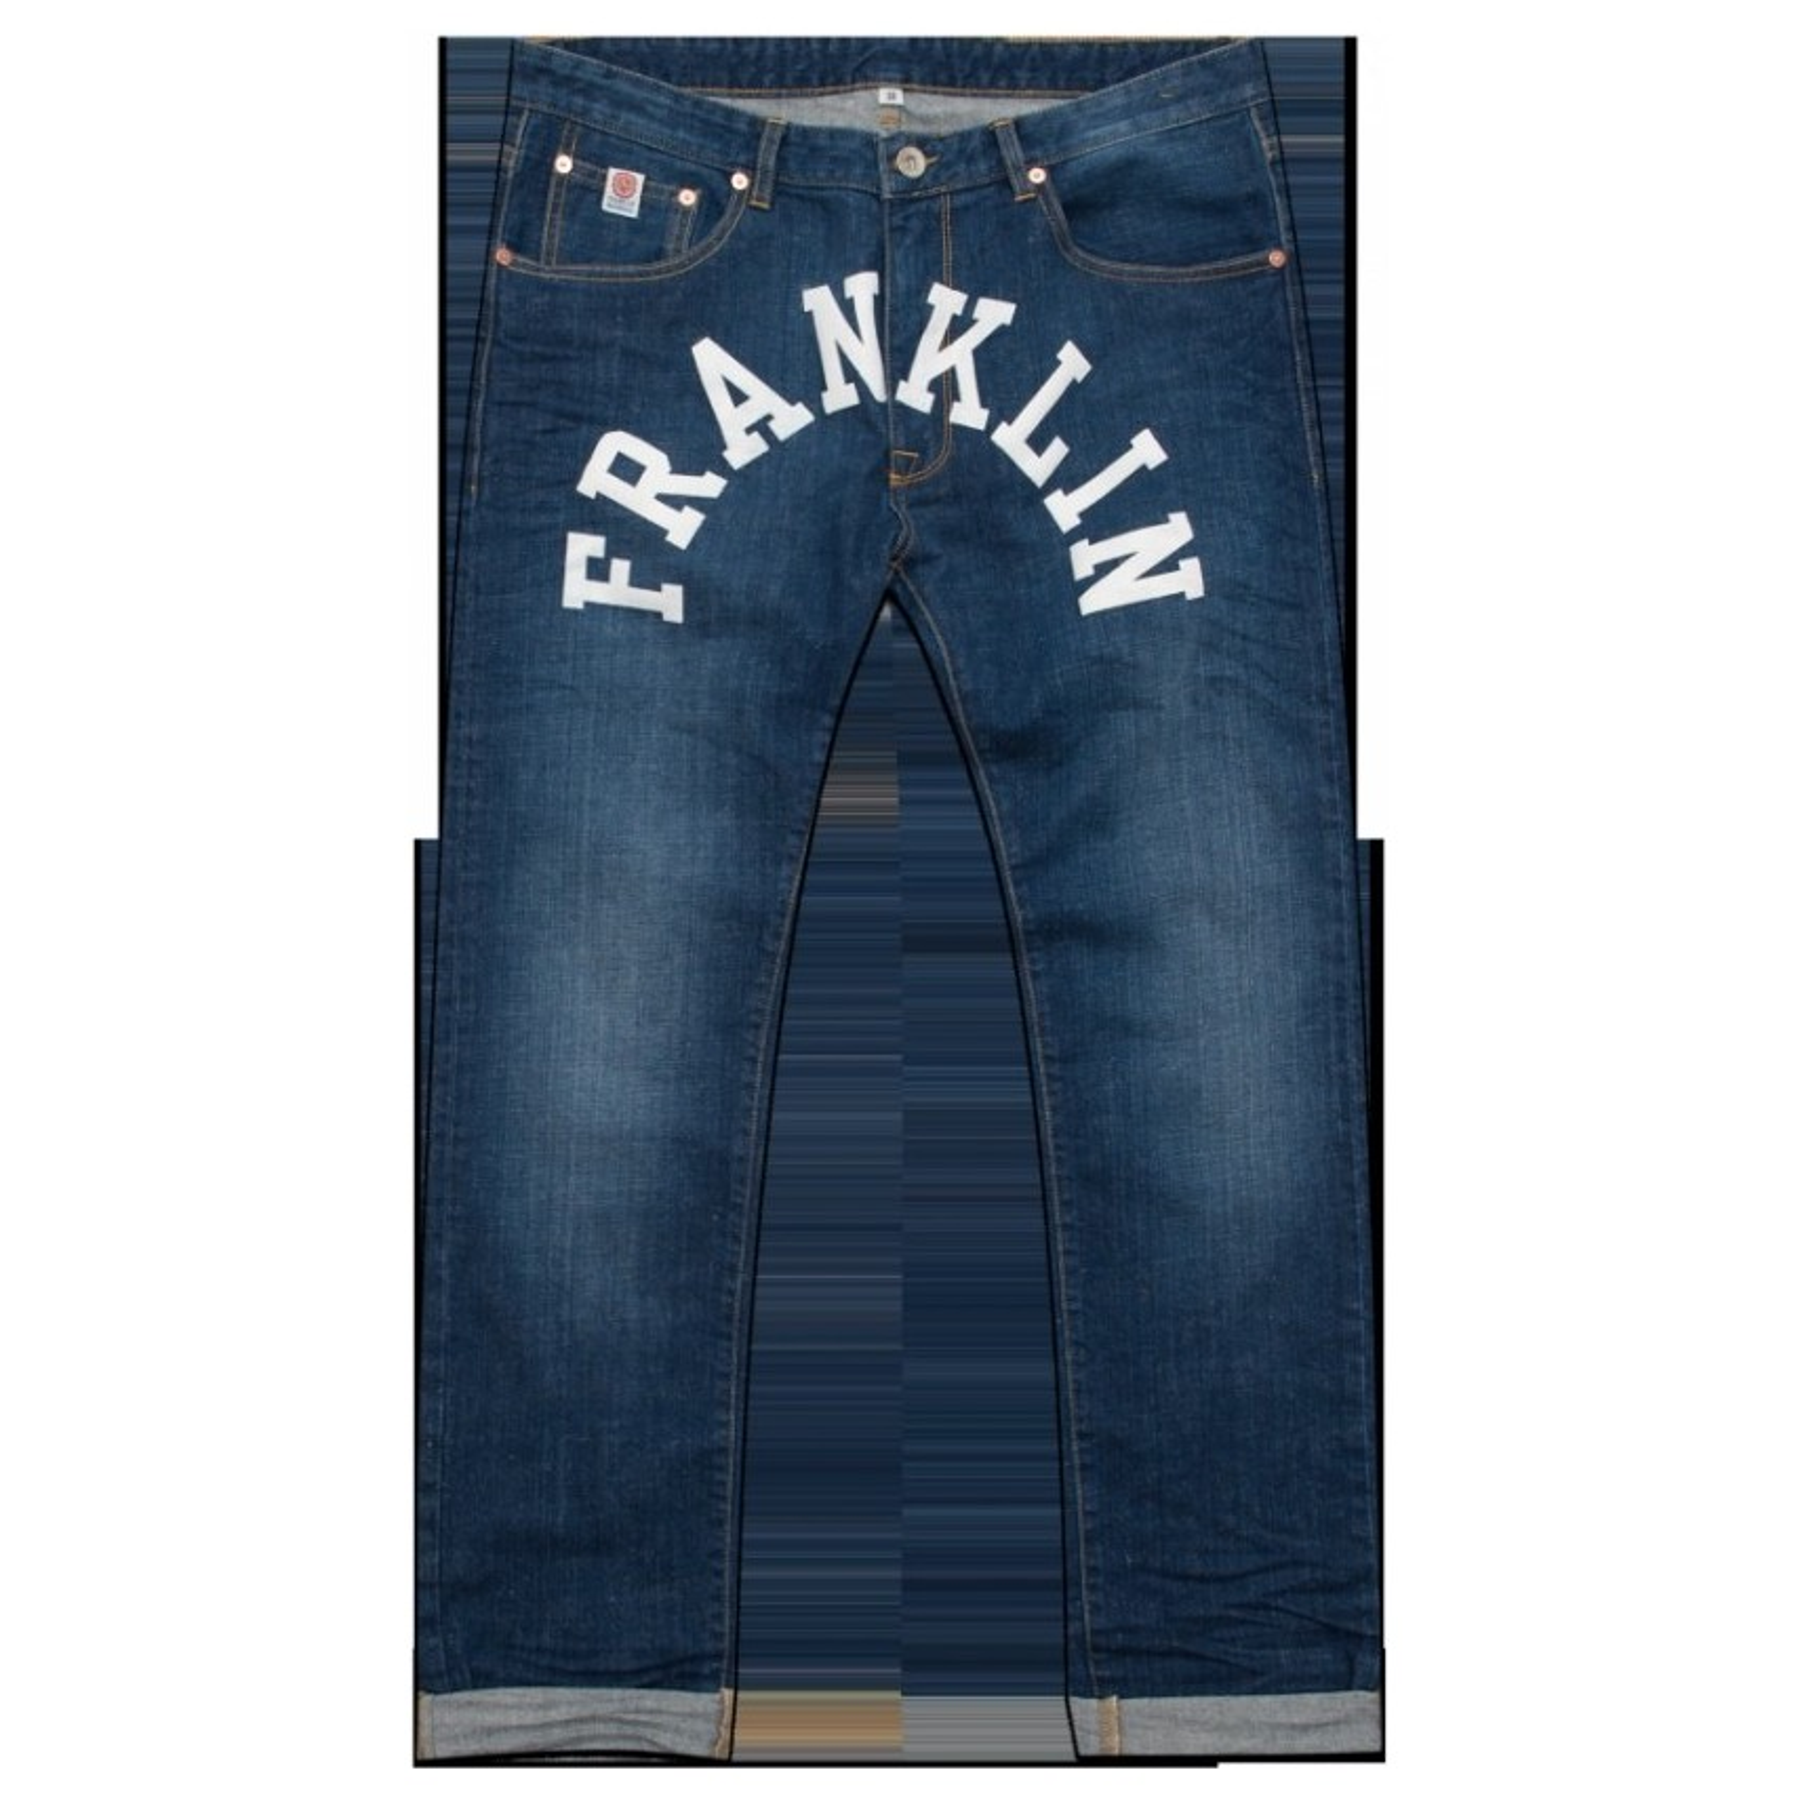 new product 55f6f 66aa5 PANTALONE LUNGO FRANKLIN MARSHALL JEANS REGULAR FIT CHICAGO Stencil Wash  unico   Atipicishop.com